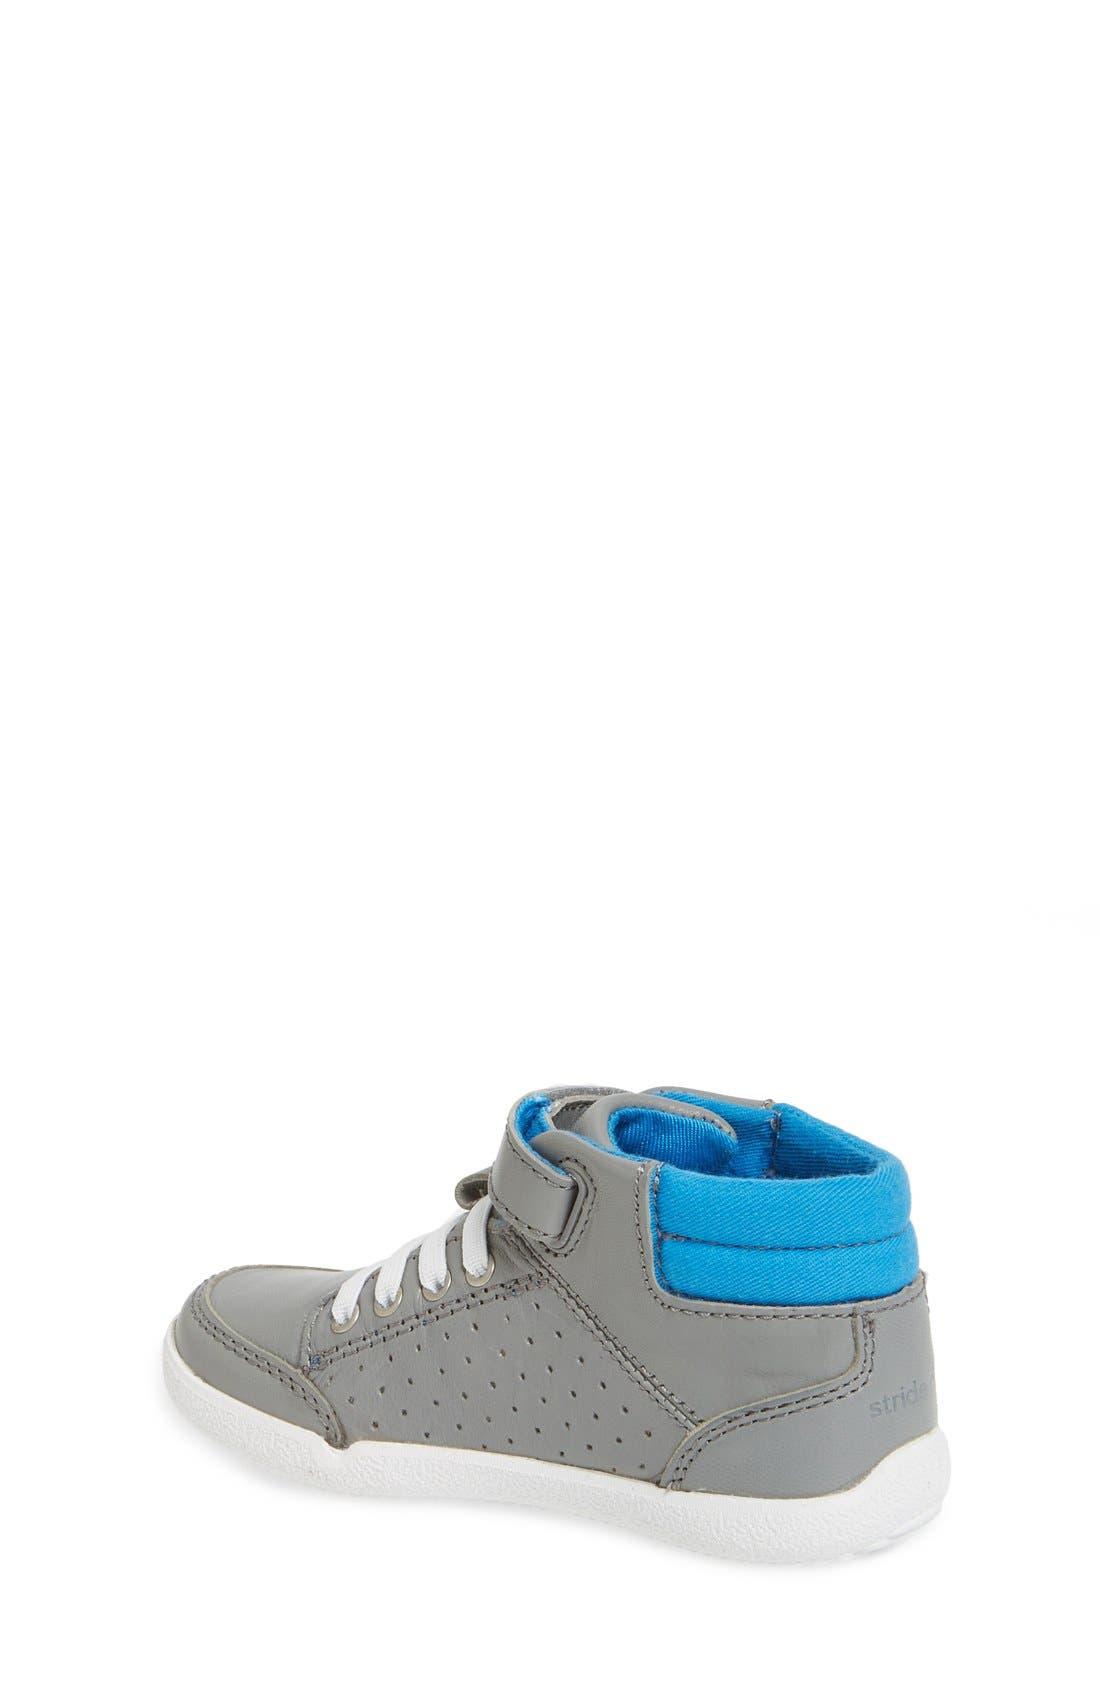 'Stone' Sneaker,                             Alternate thumbnail 2, color,                             020